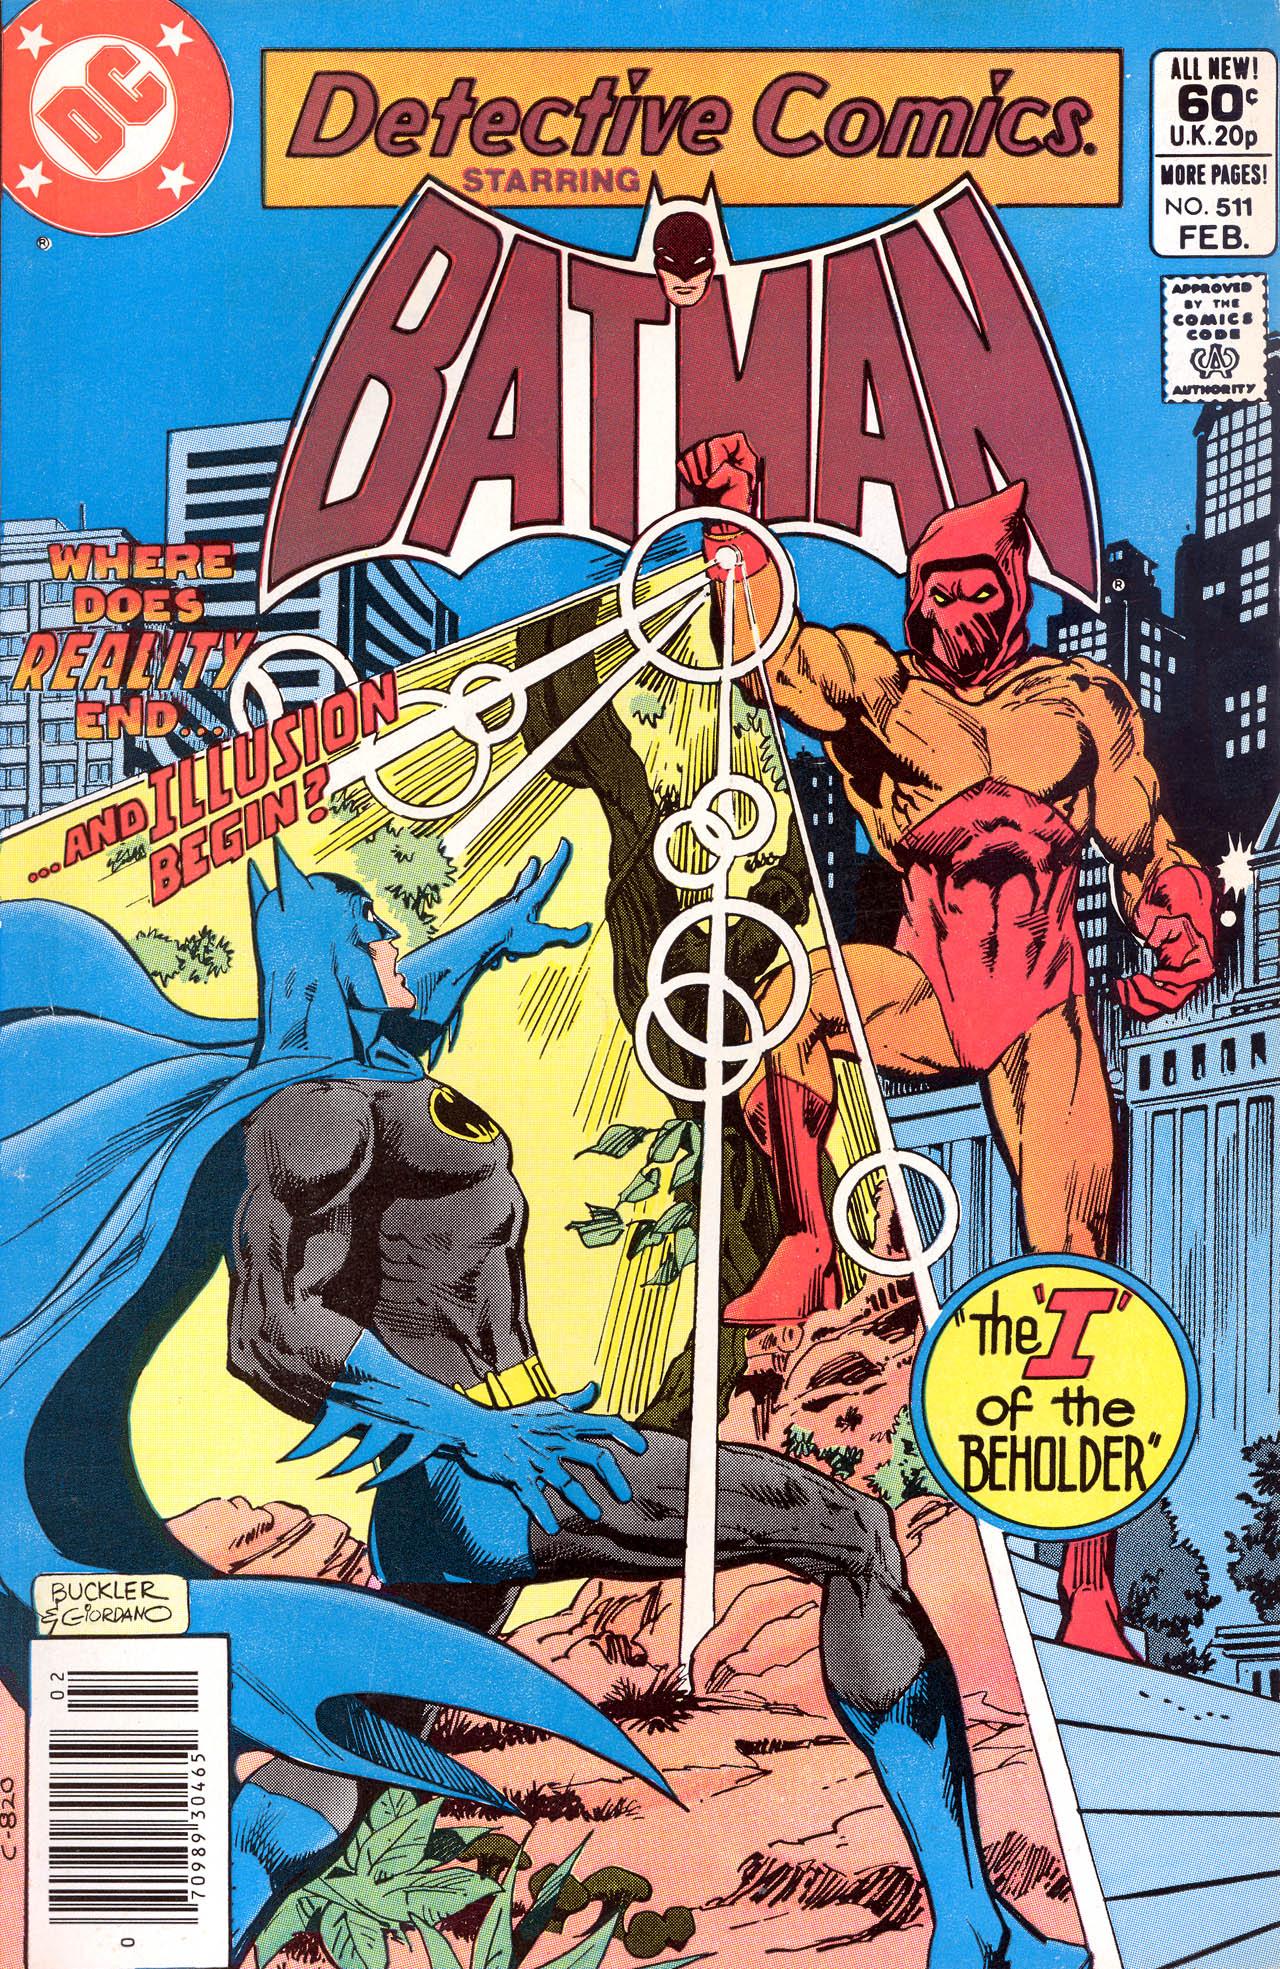 Detective Comics (1937) 511 Page 1